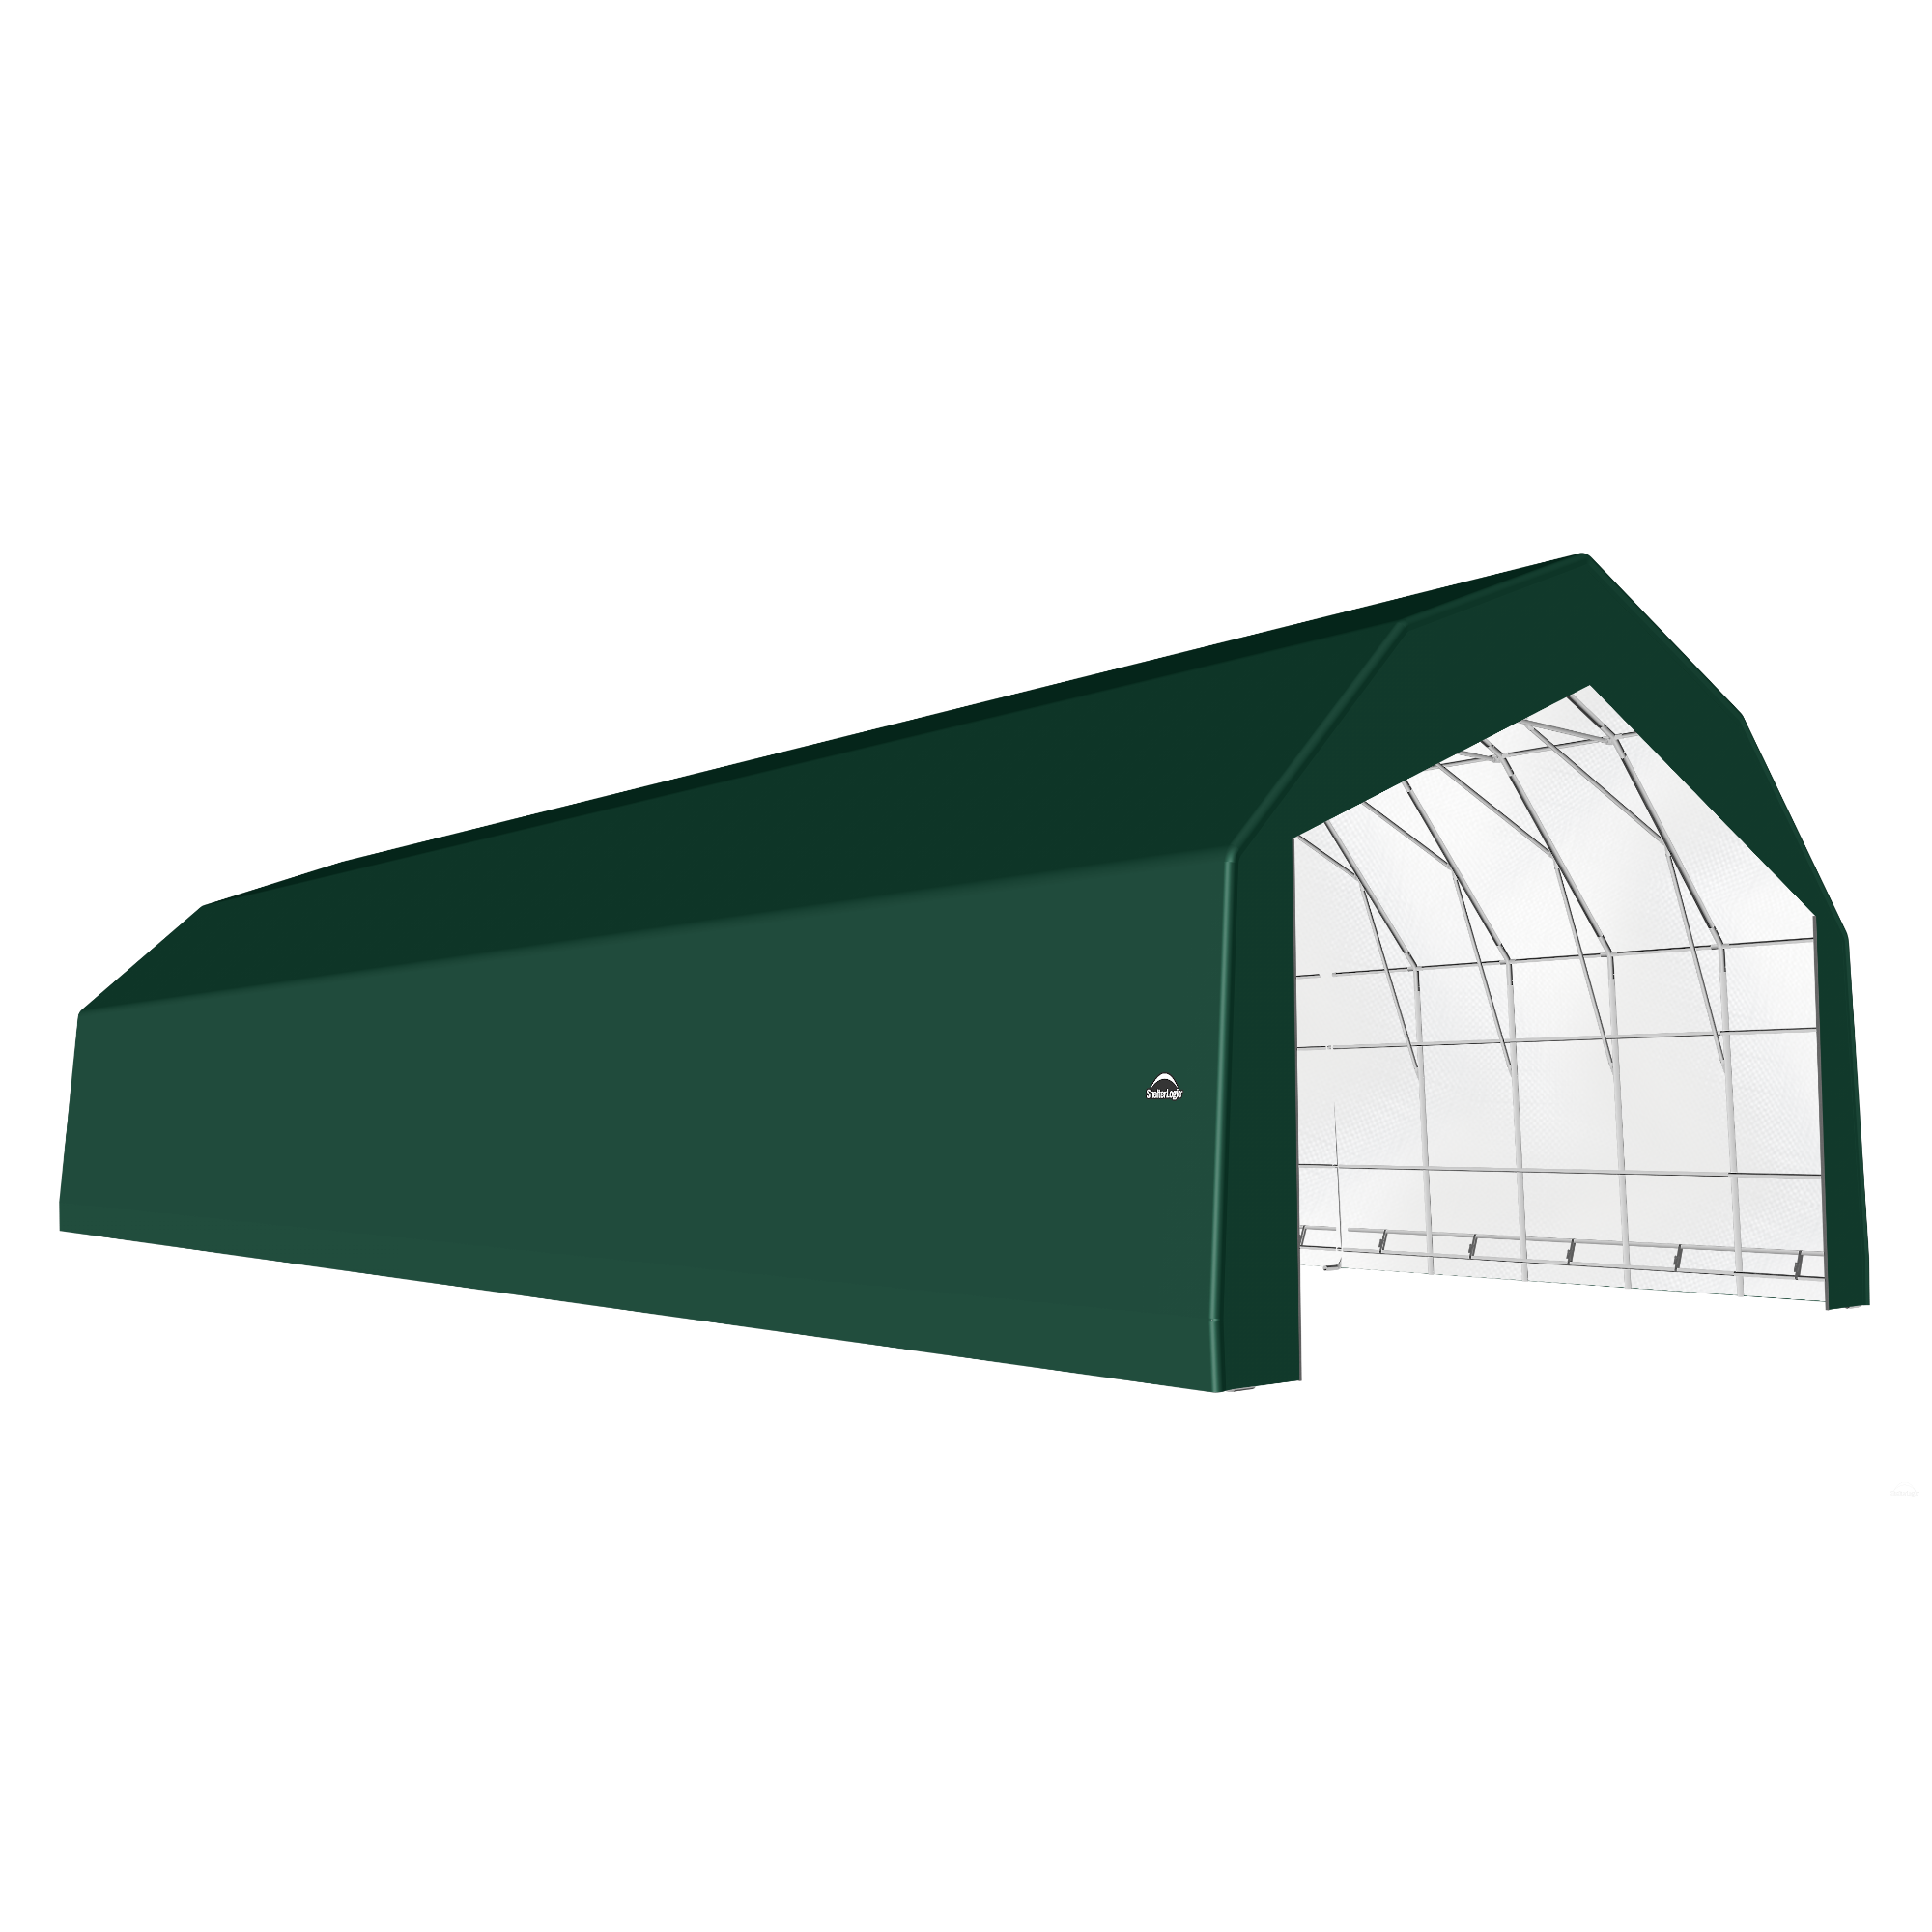 SP Barn 30X84X21 Green 14 oz PE Shelter